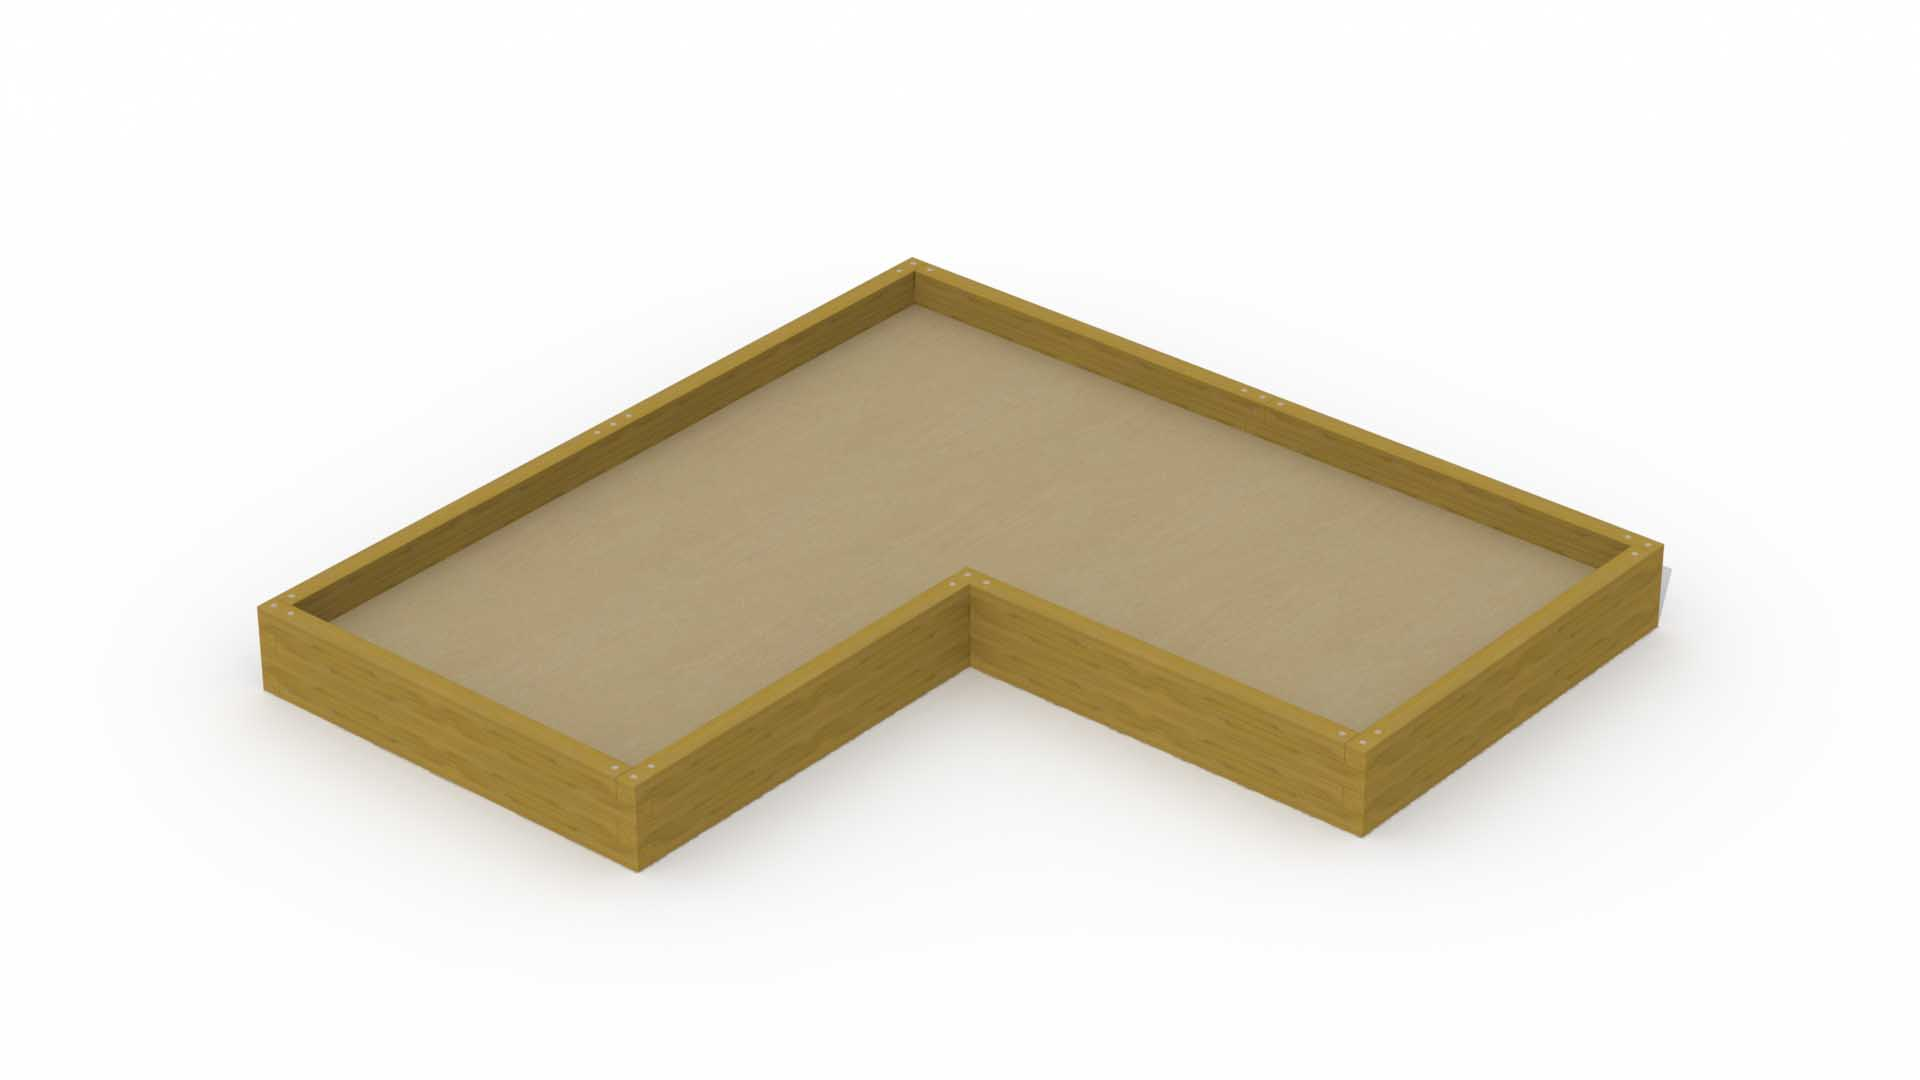 Beam Sandbox (3,8 X 1,8 M) (L-shaped)